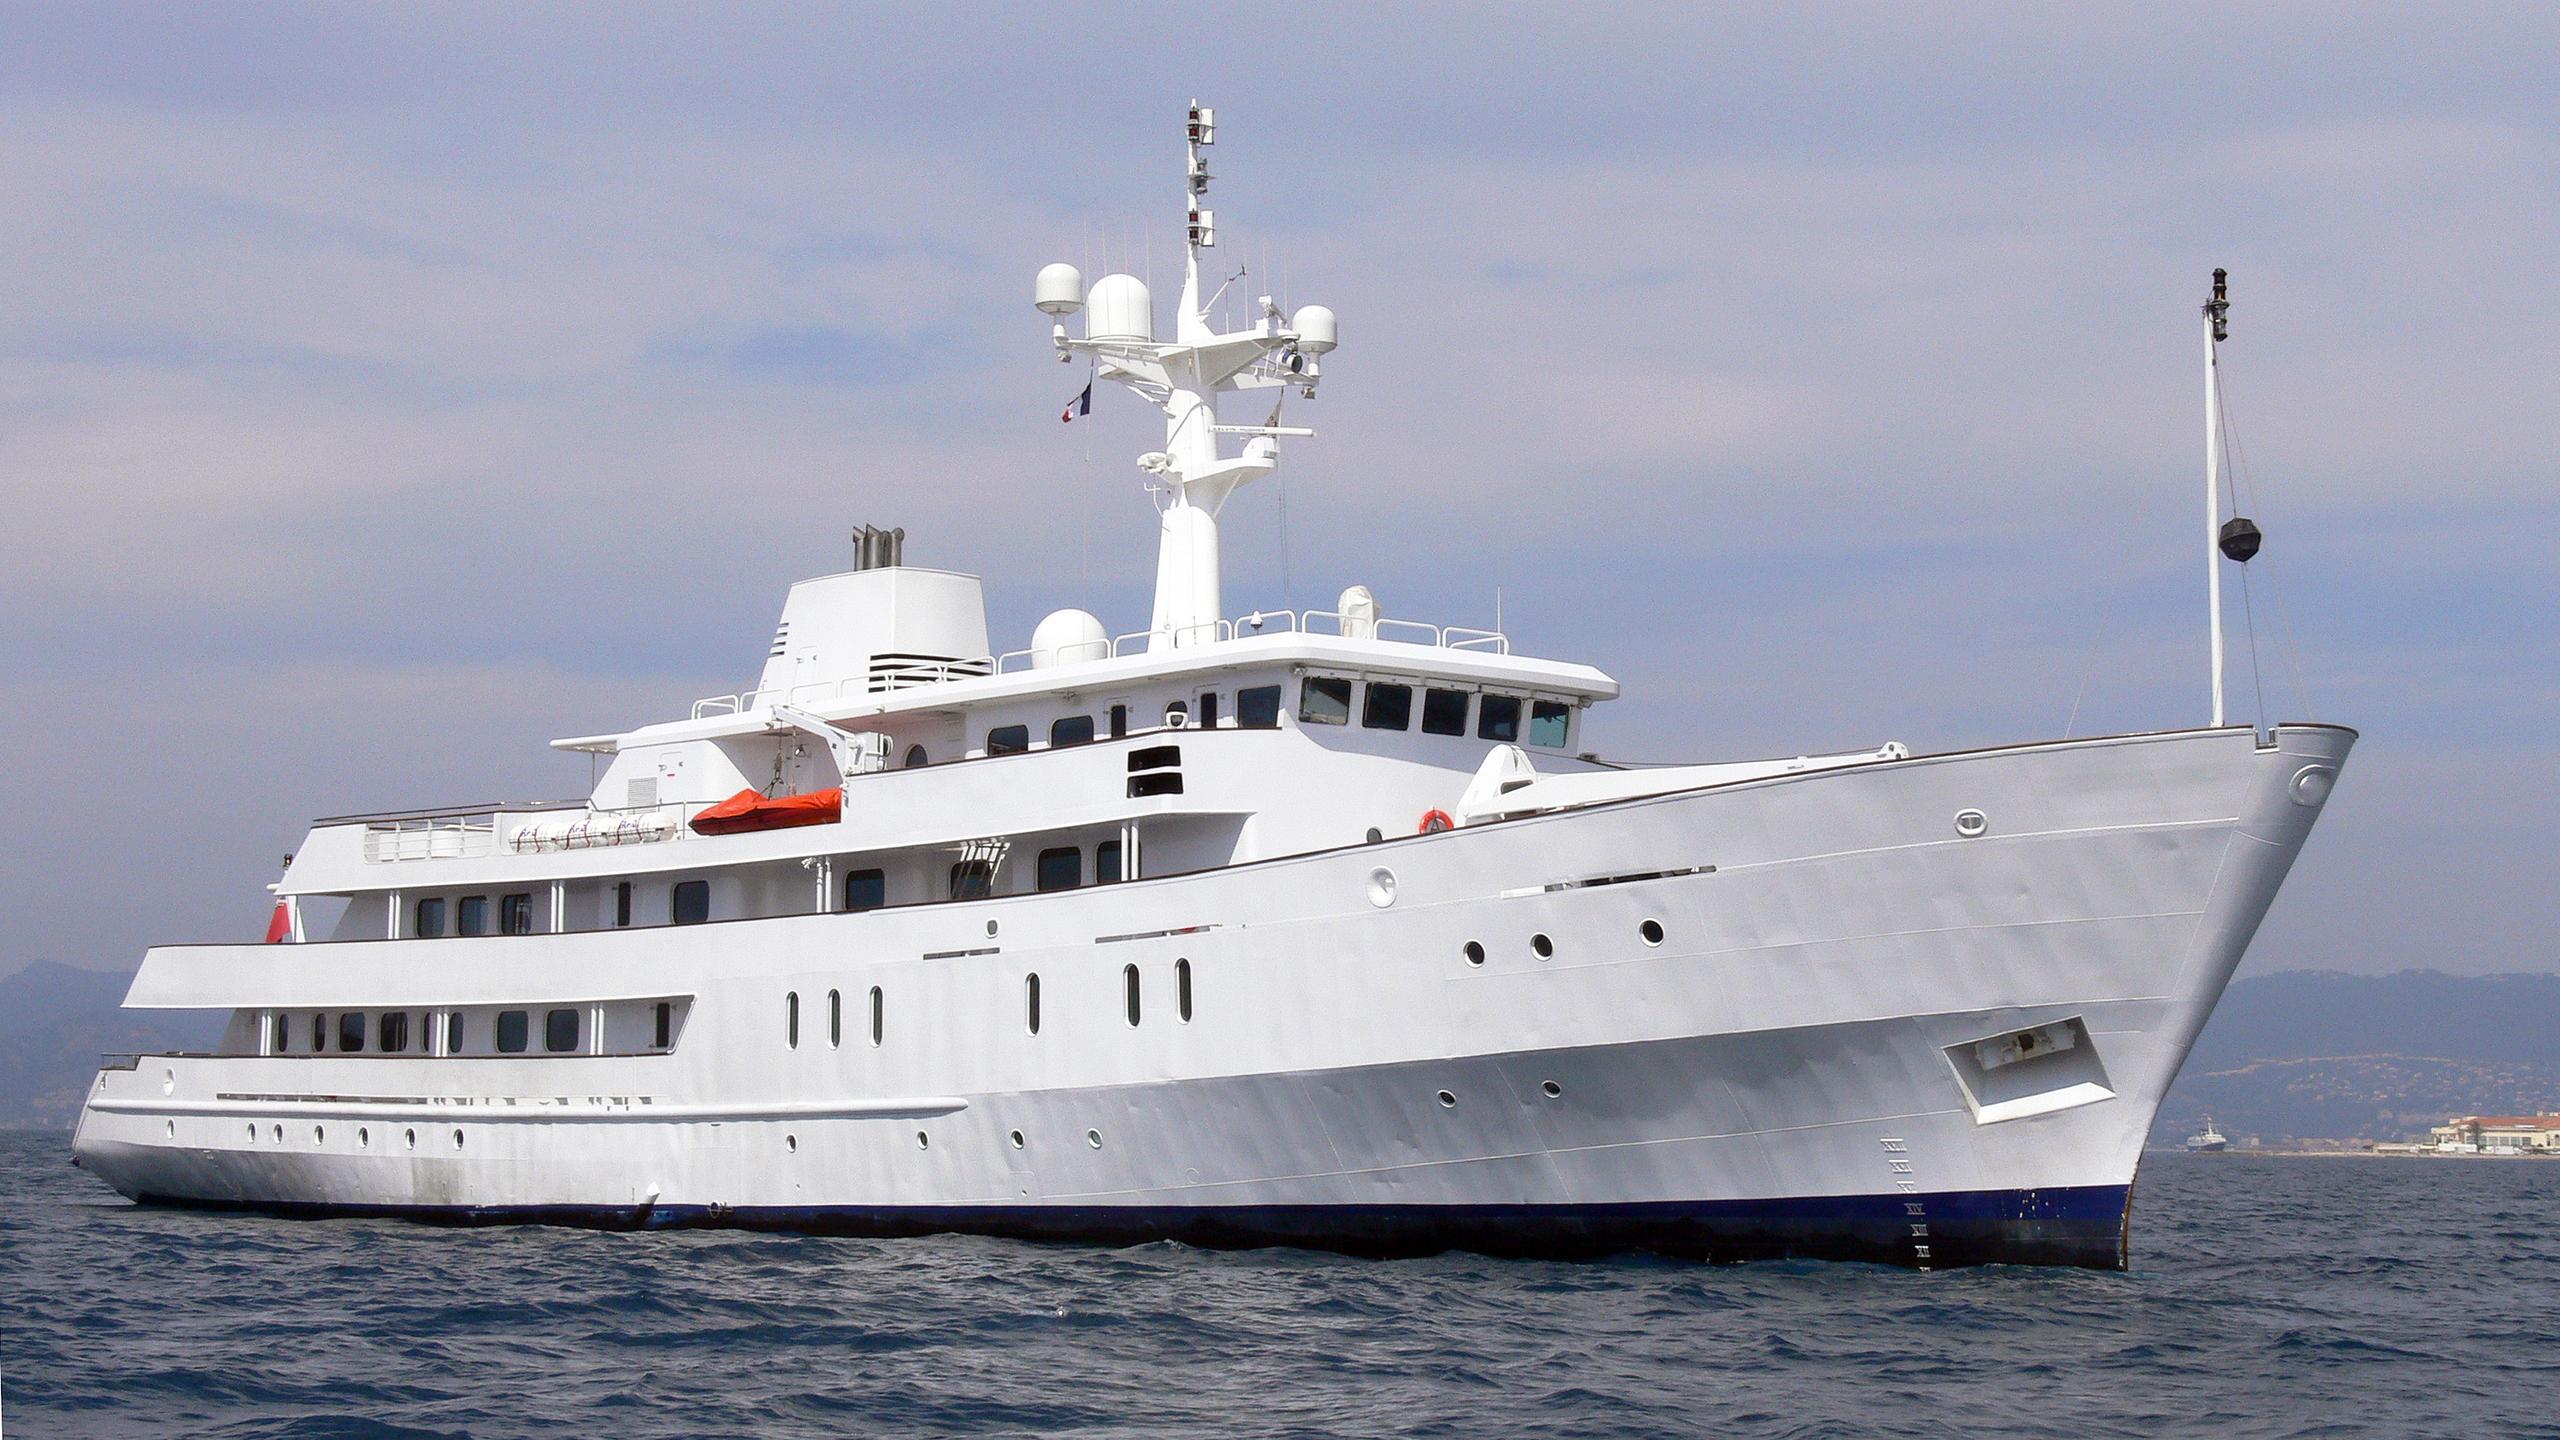 titan-half-explorer-yacht-brooke-1968-60m-profile-before-refit